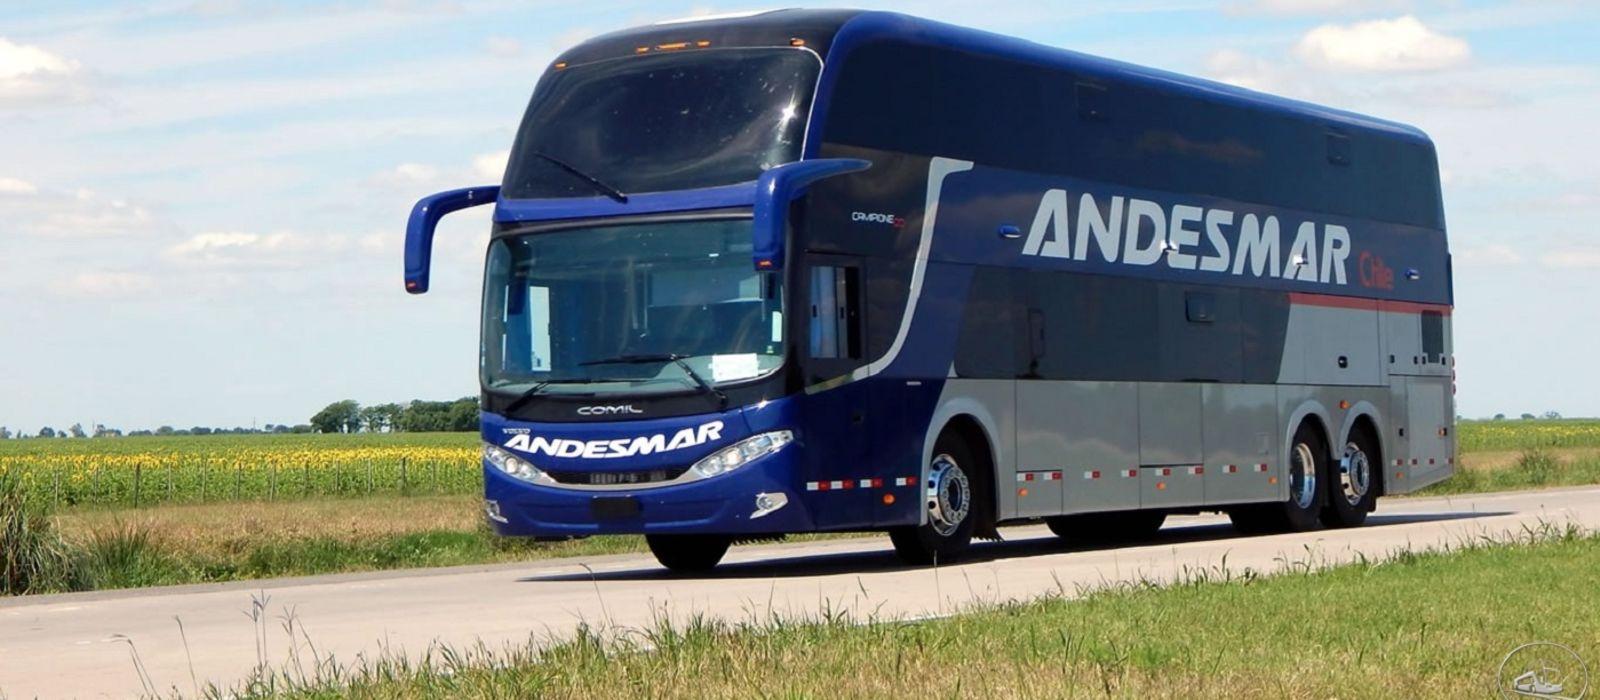 Hotel Night Bus Argentina